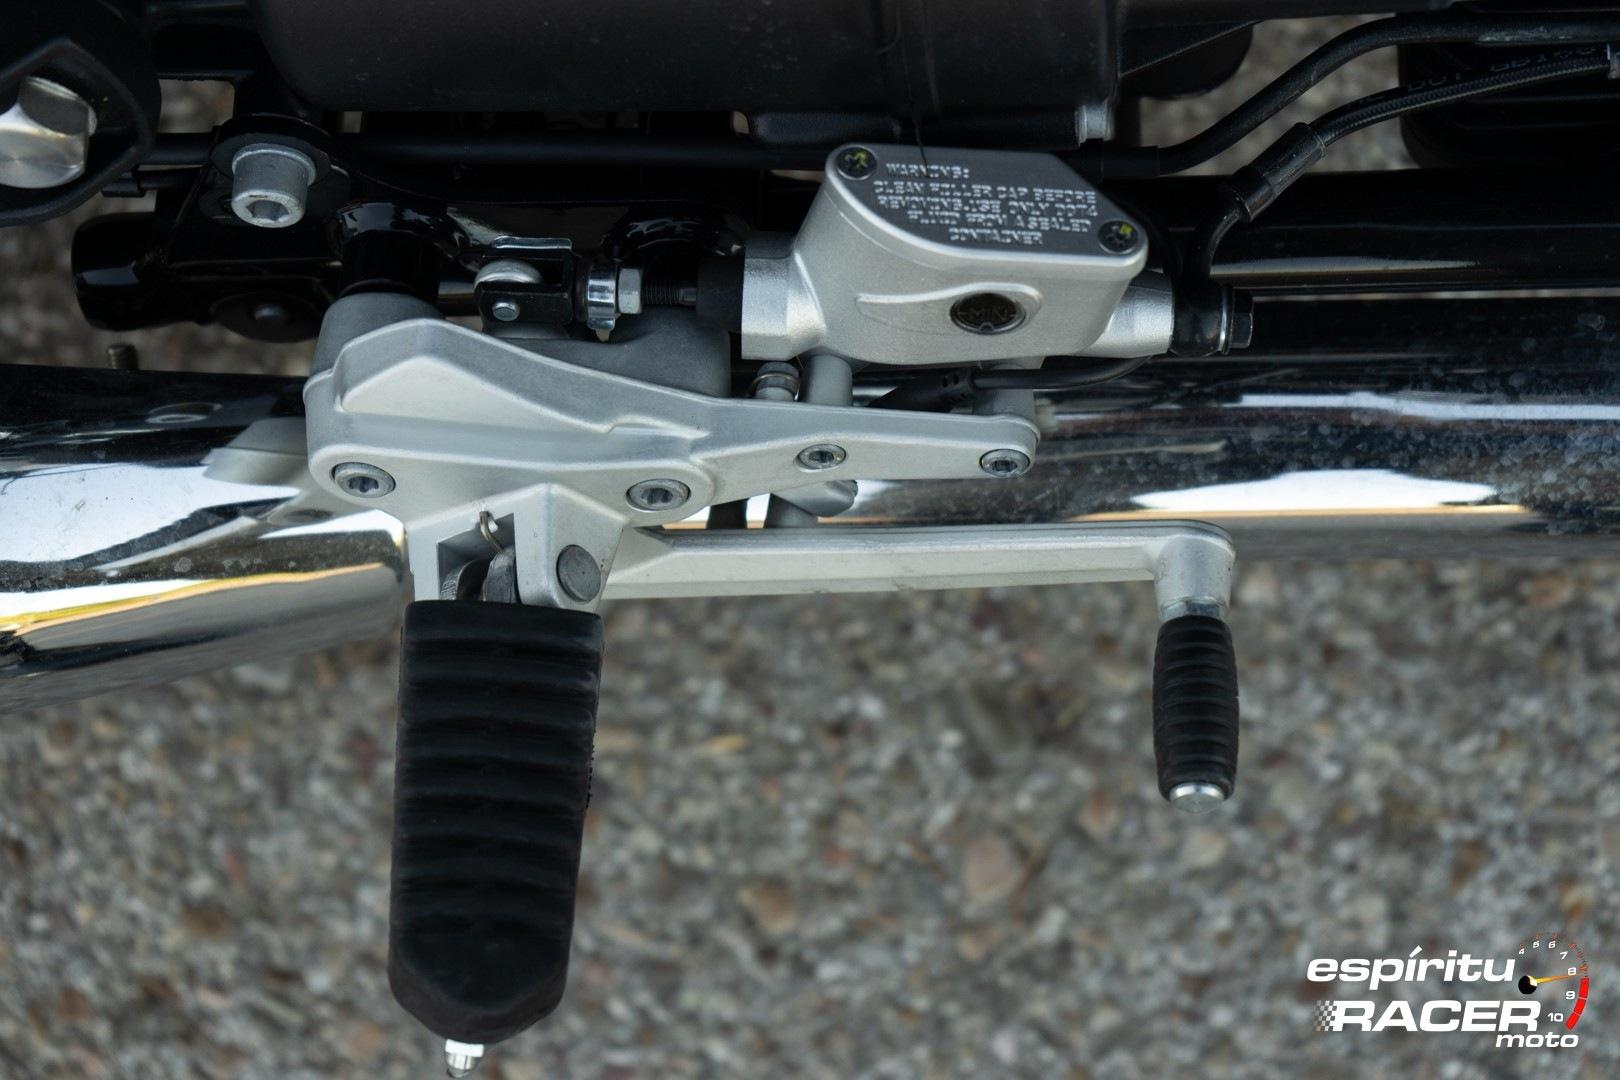 Moto Guzzi V7 850 Special 106